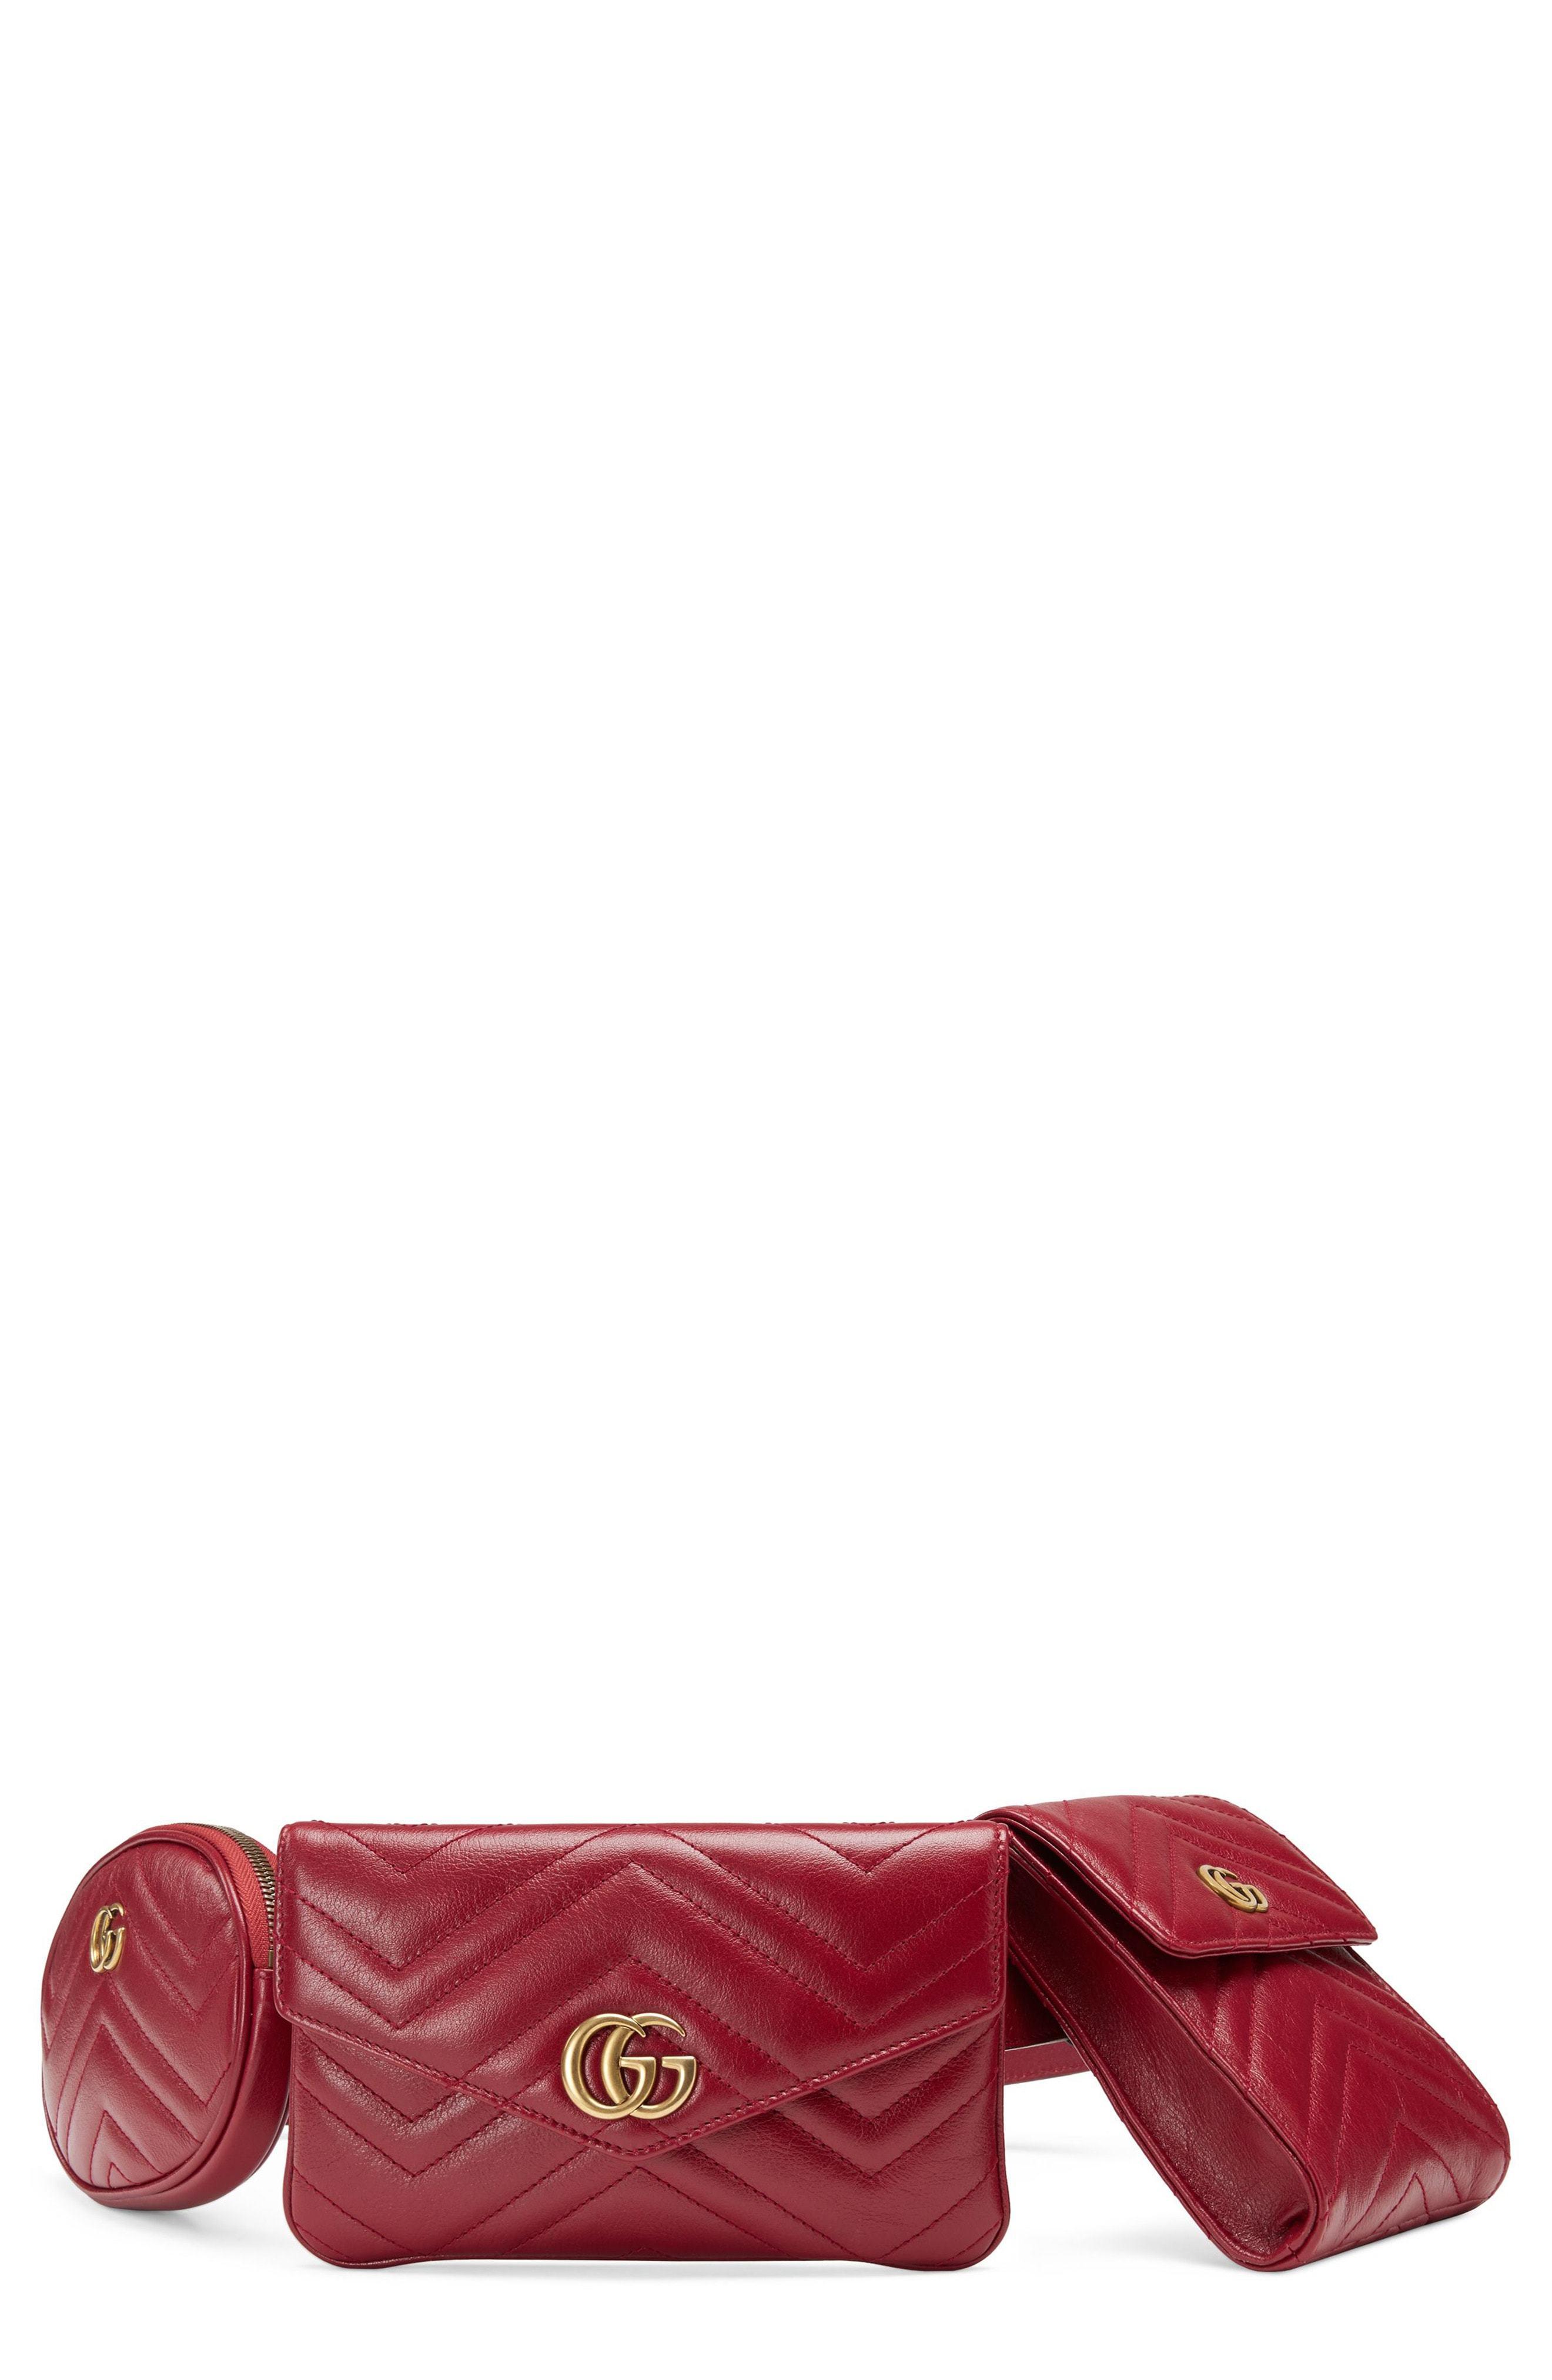 c4ab615ae77d Gucci Gg Marmont 20 Matelasse Triple Pouch Leather Belt Bag, $1,790 ...